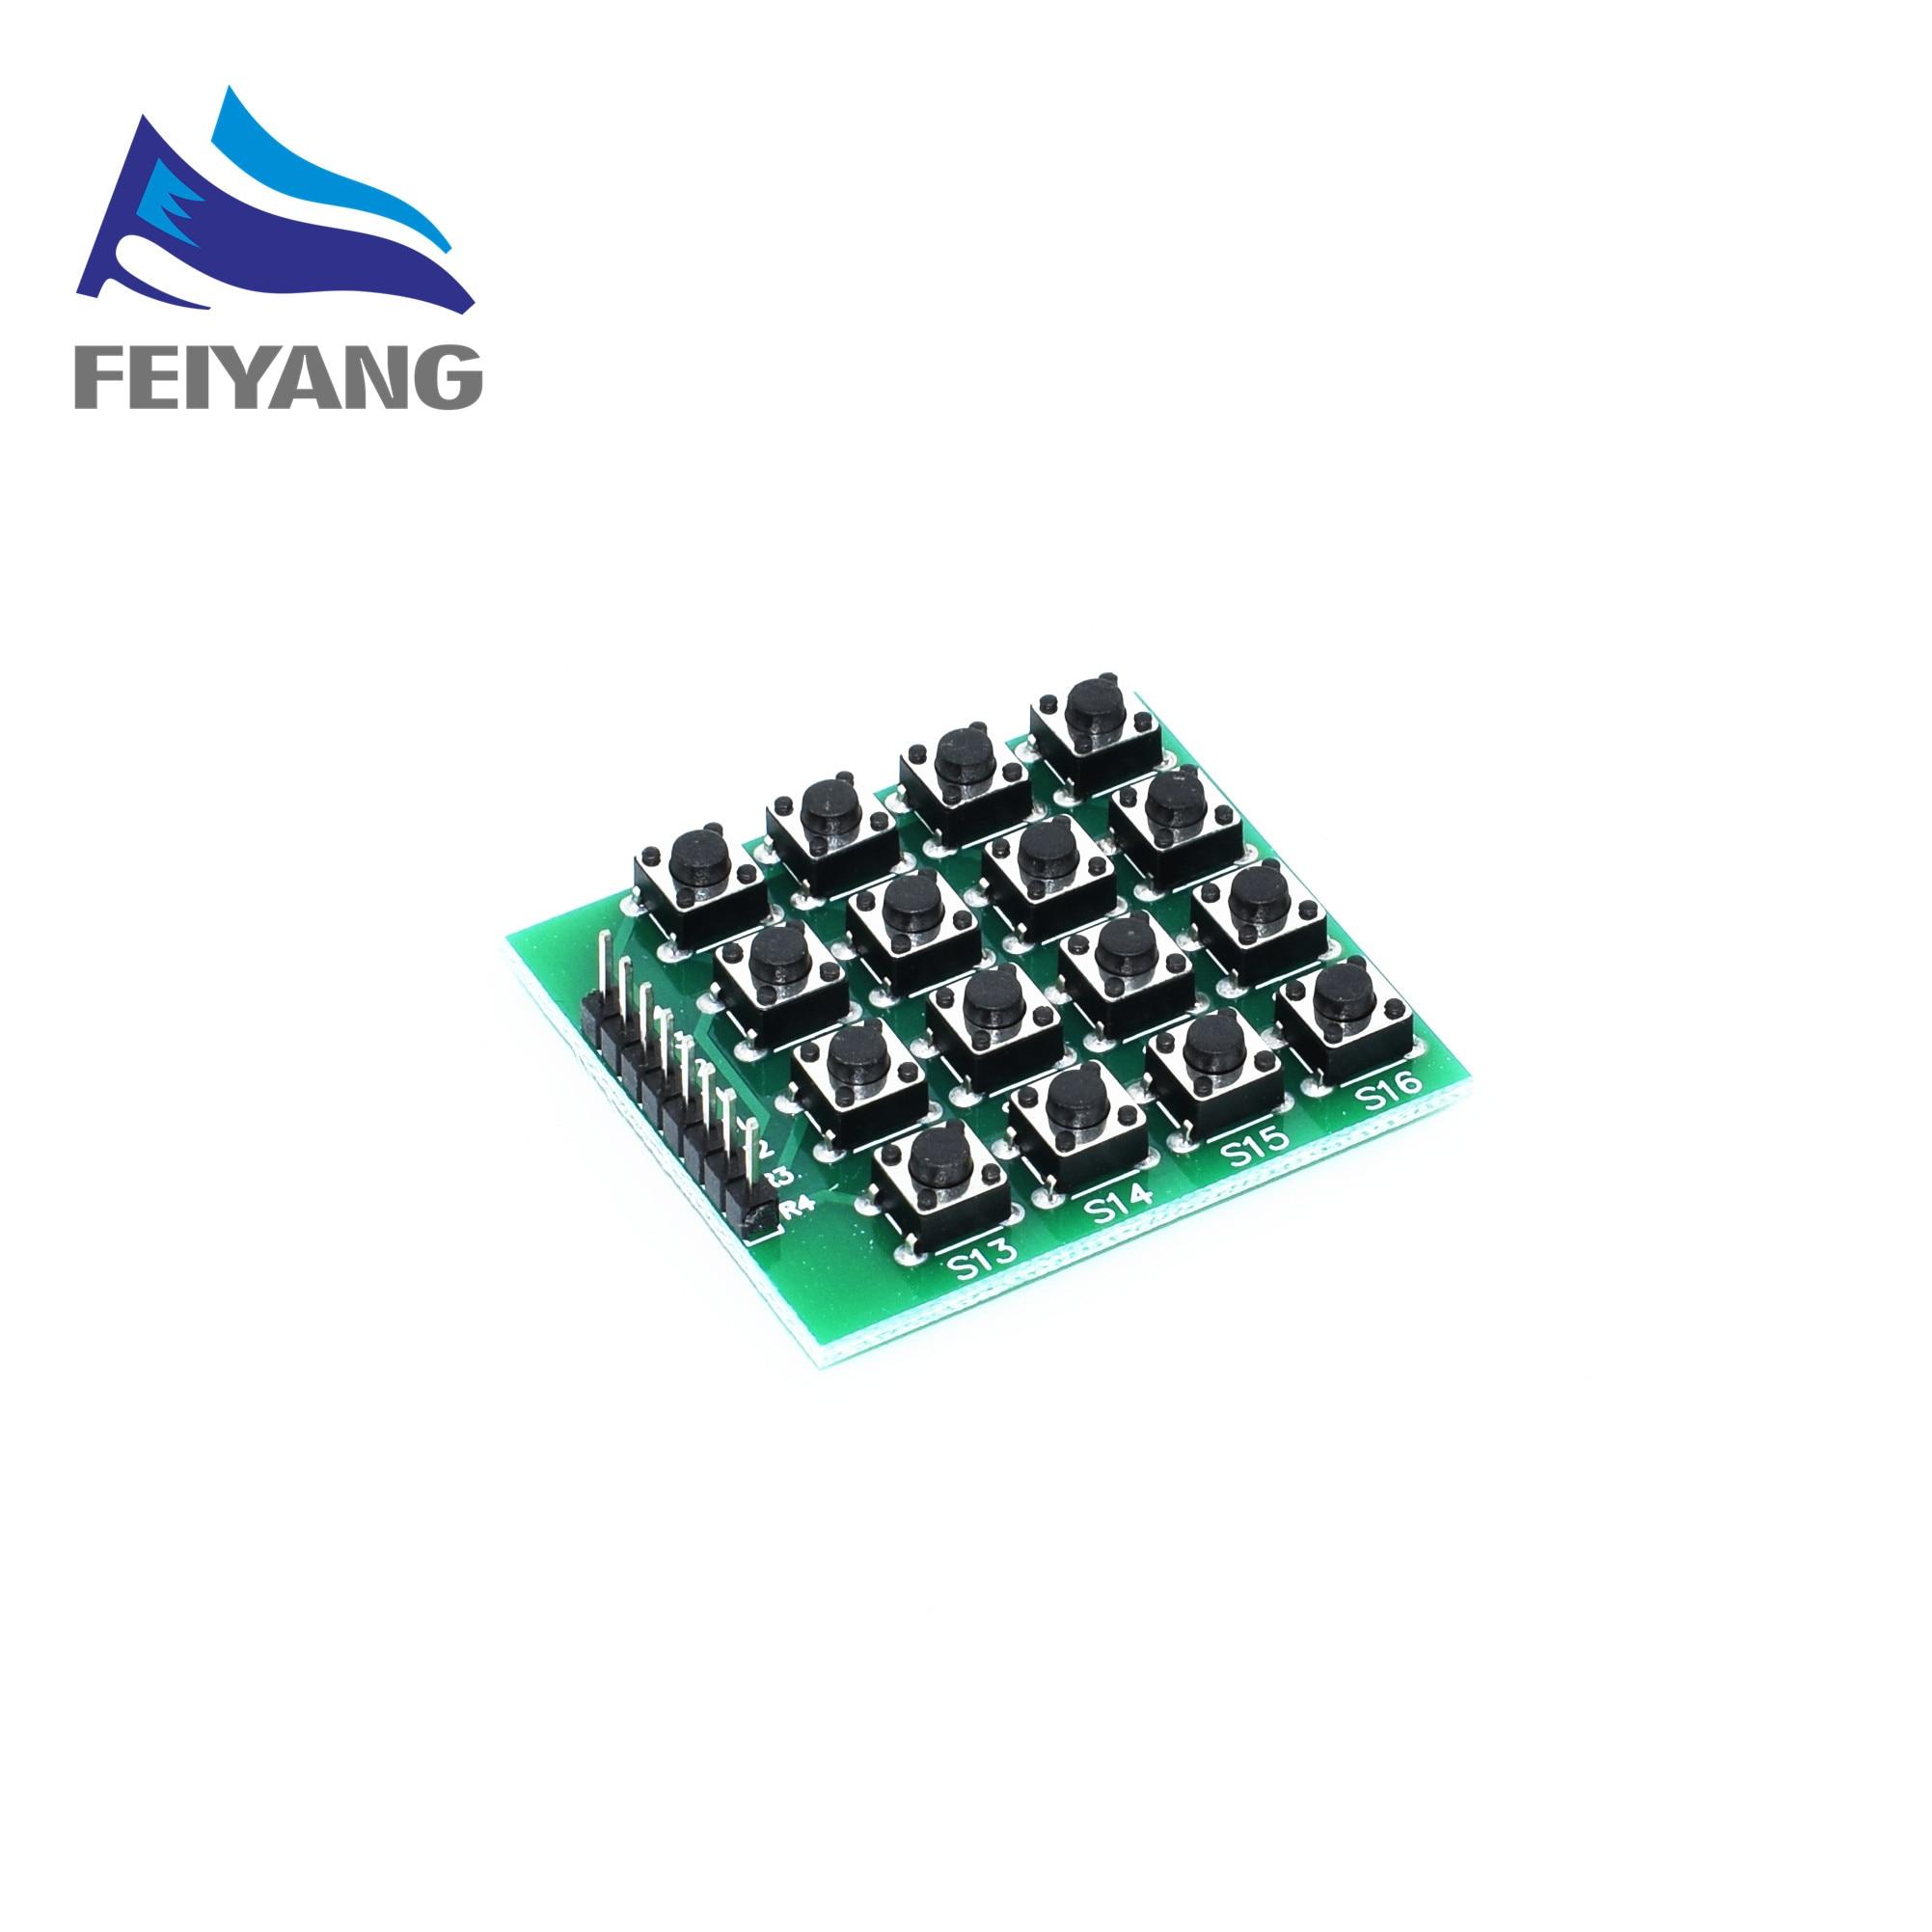 1PCS 4x4 Matrix 16 Keypad Keyboard Module 16 Button Mcu